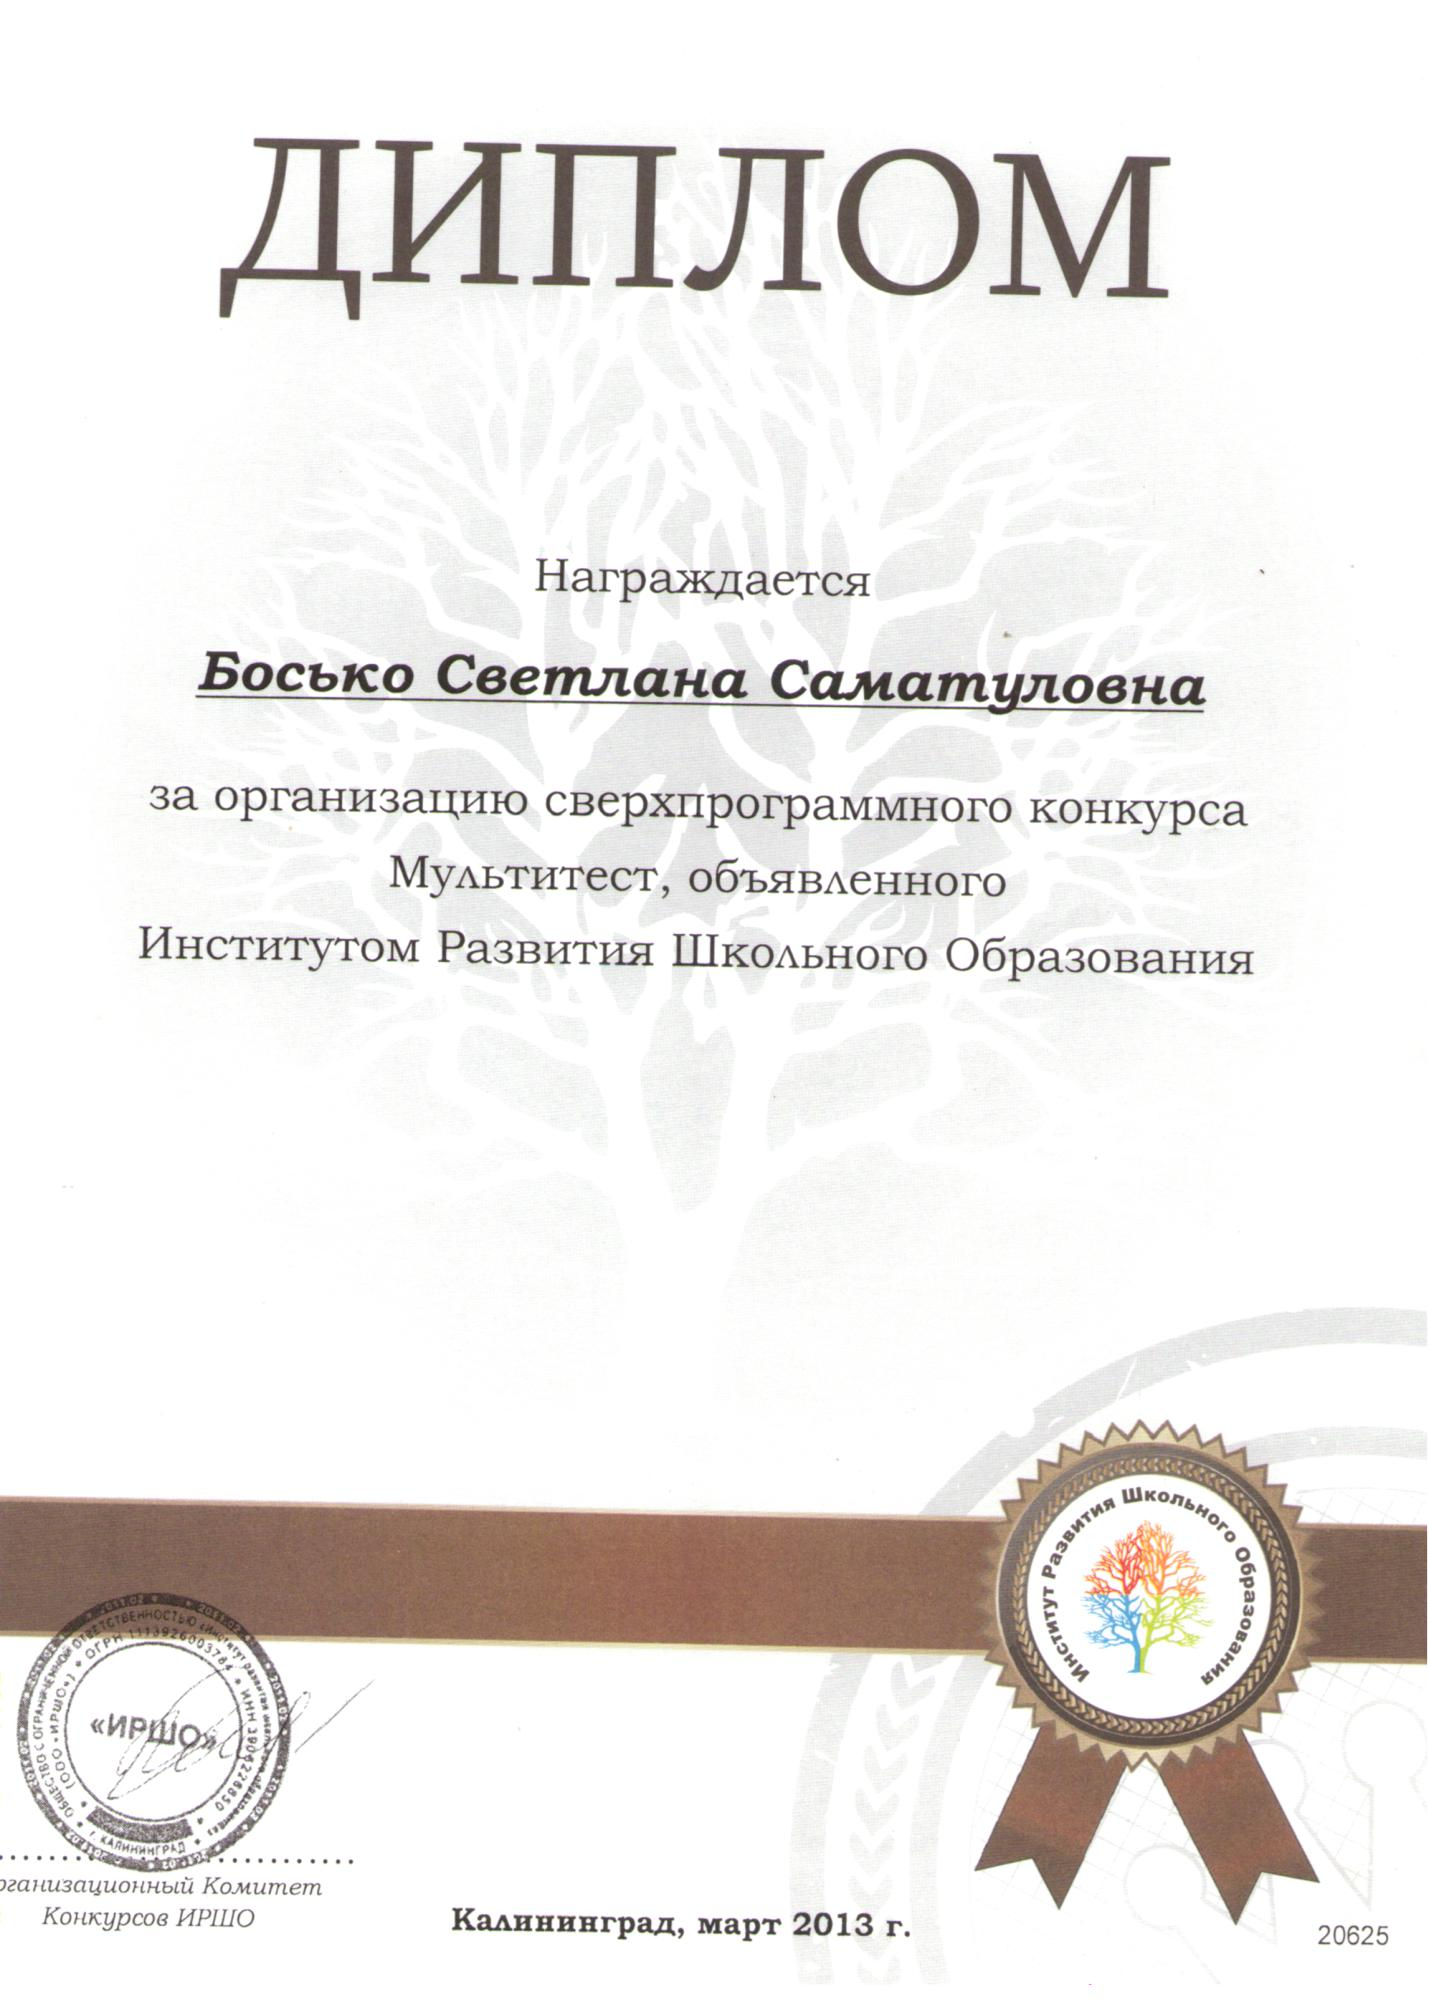 C:\Documents and Settings\Светлана Саматуловна\Рабочий стол\квалификация\13 диплом.tif